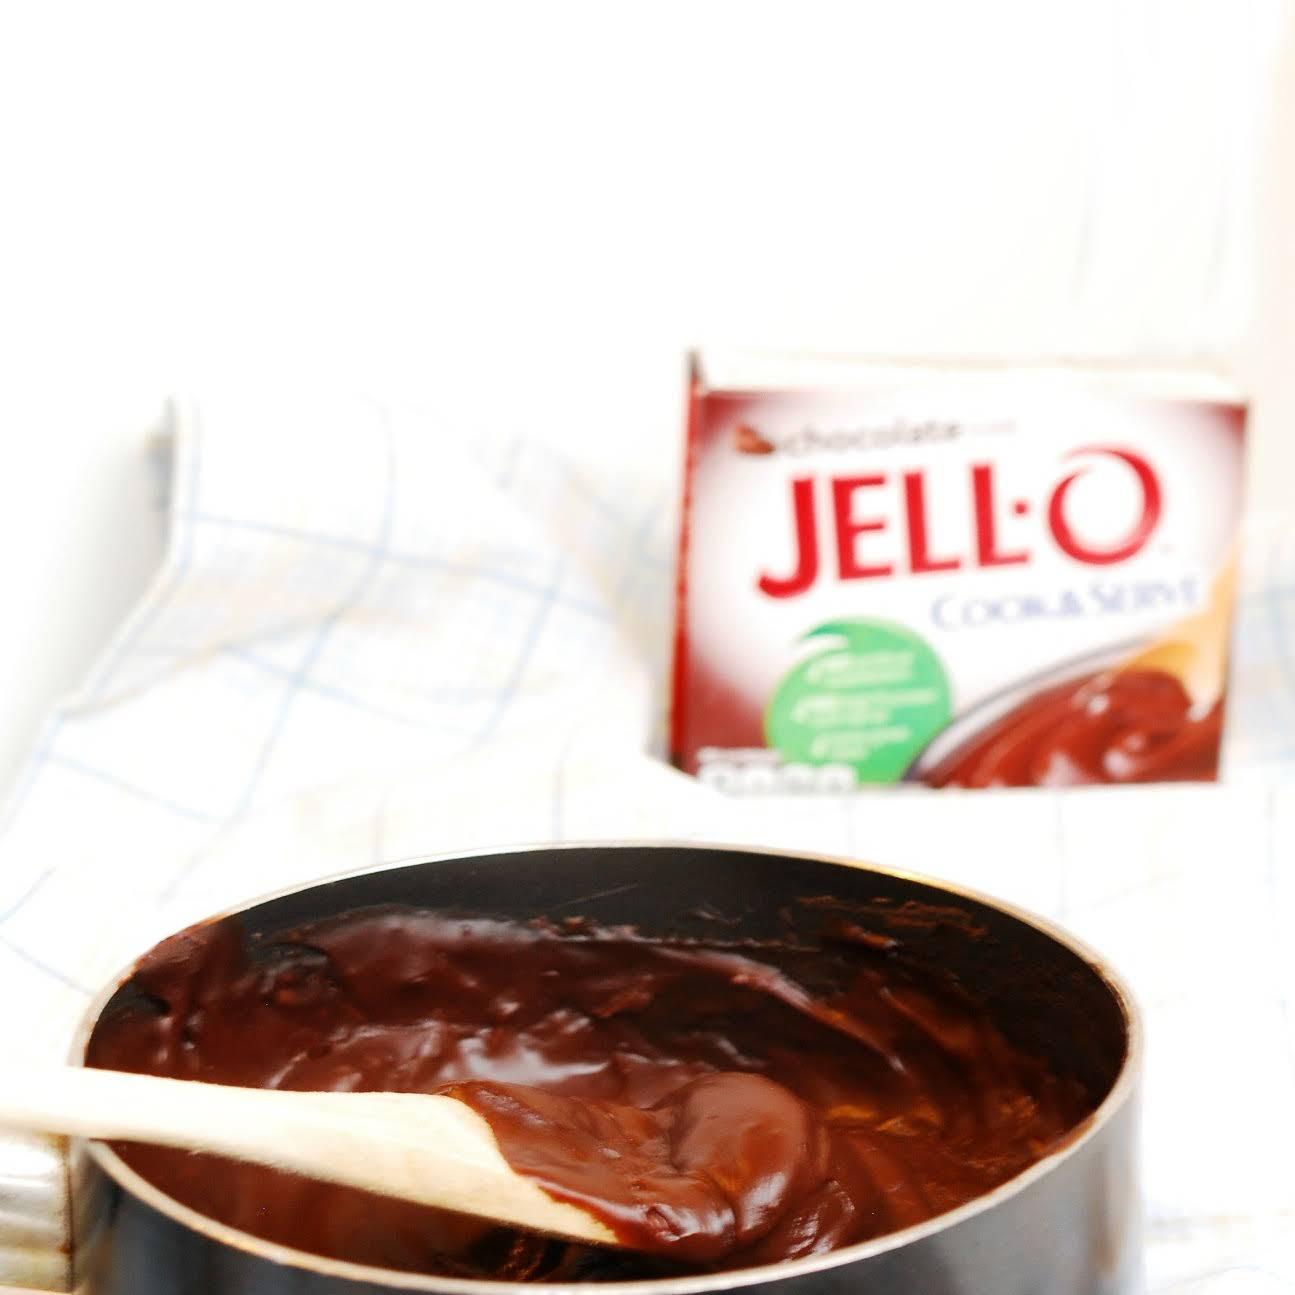 Dairy Free Jello Pudding (Vegan, Top 8 Free, Too!)